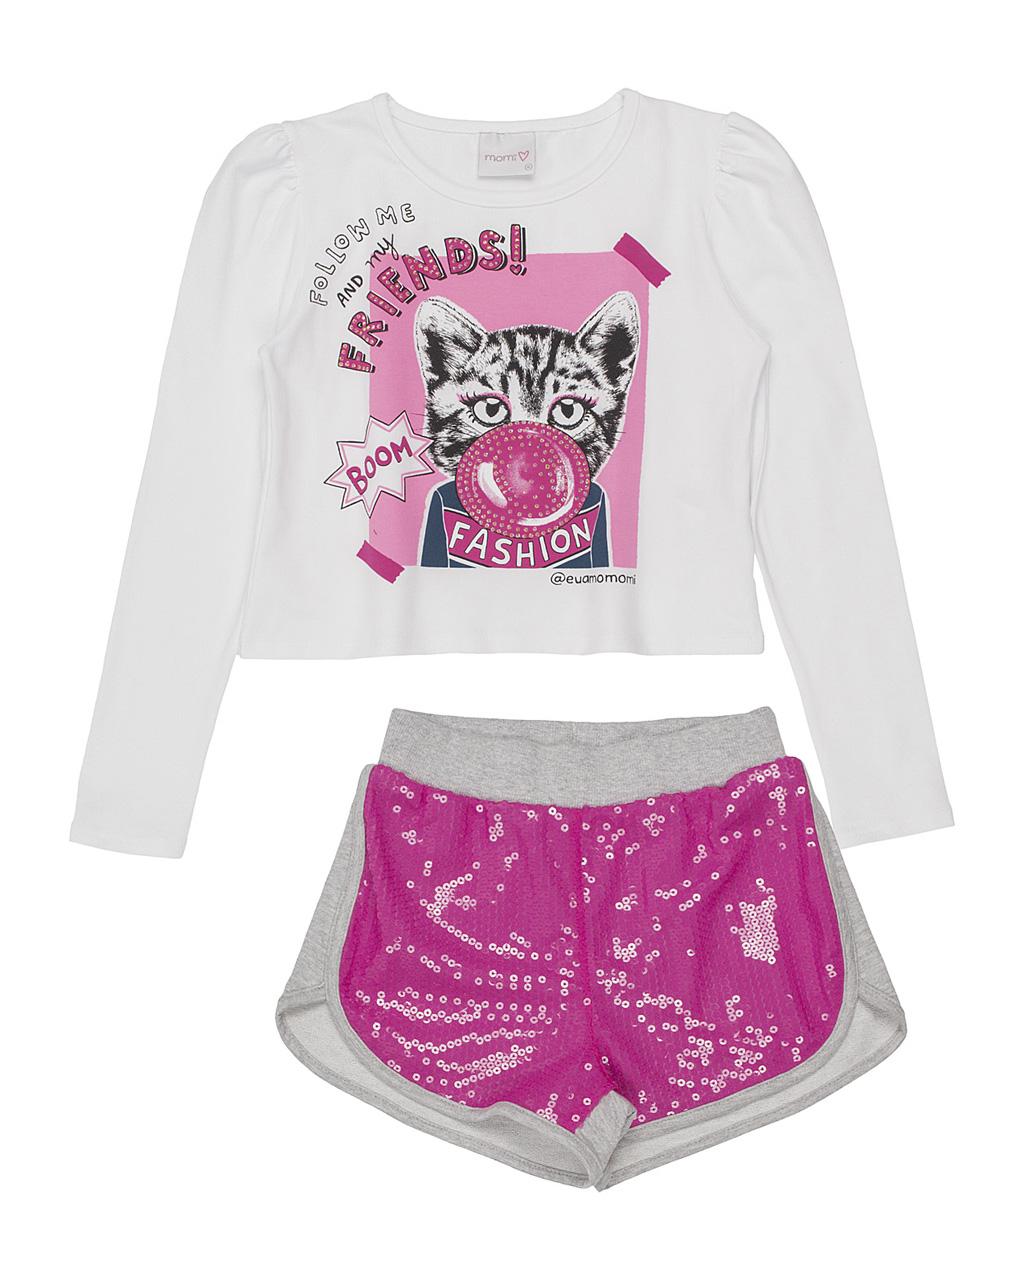 Conjunto Infantil Blusa Cat Ball Strass E Shorts Paetê Rosa Momi